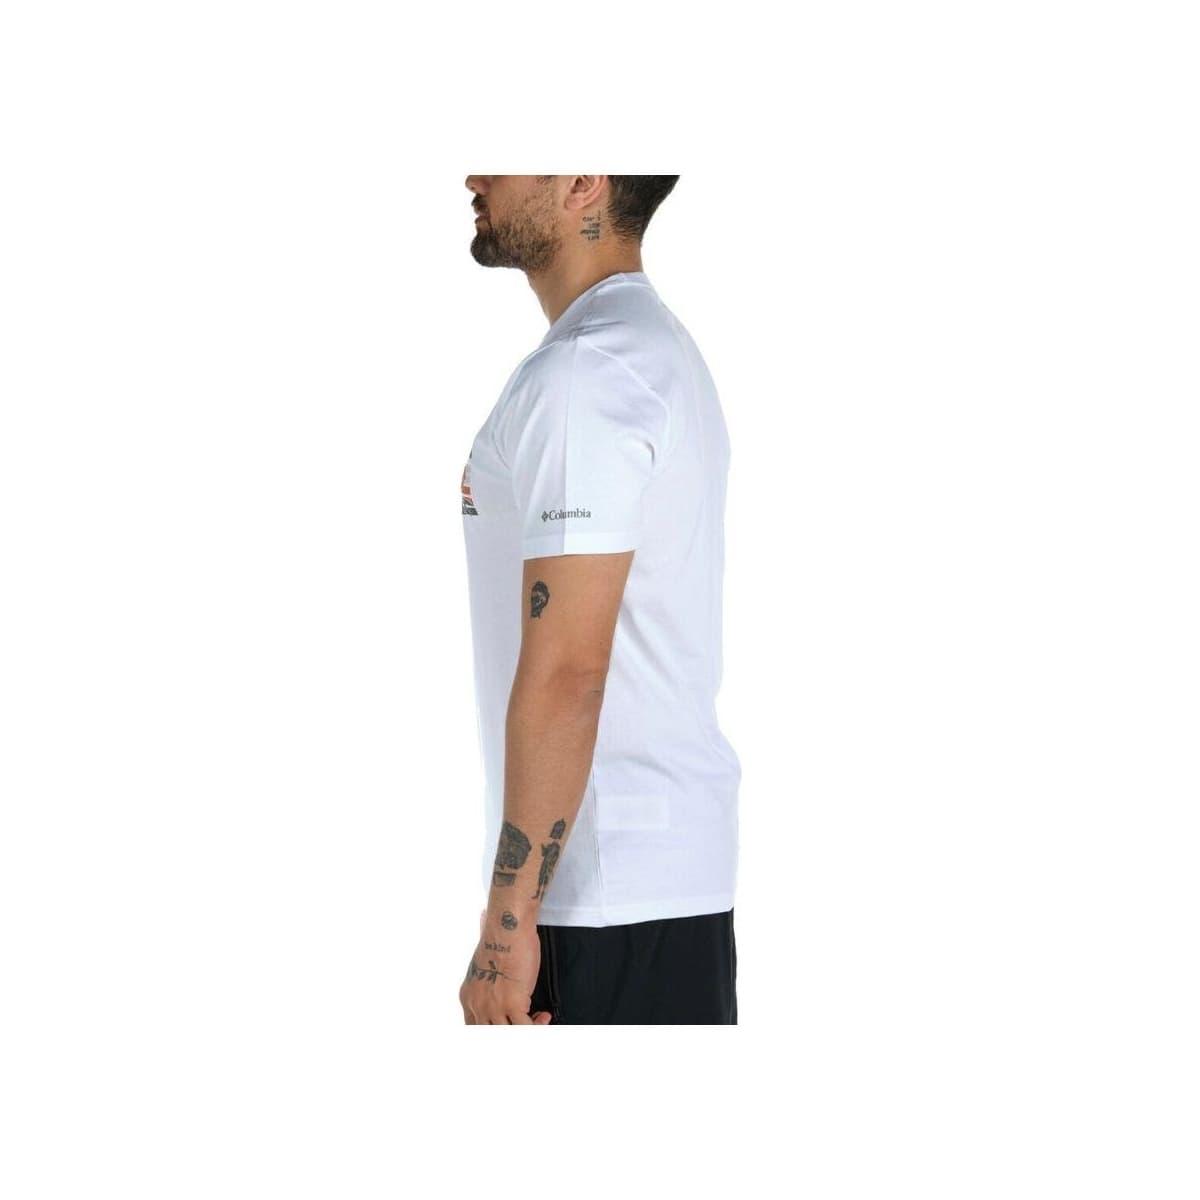 Elevated Outlook Graphic Erkek Beyaz Tişört (CS0132_100)